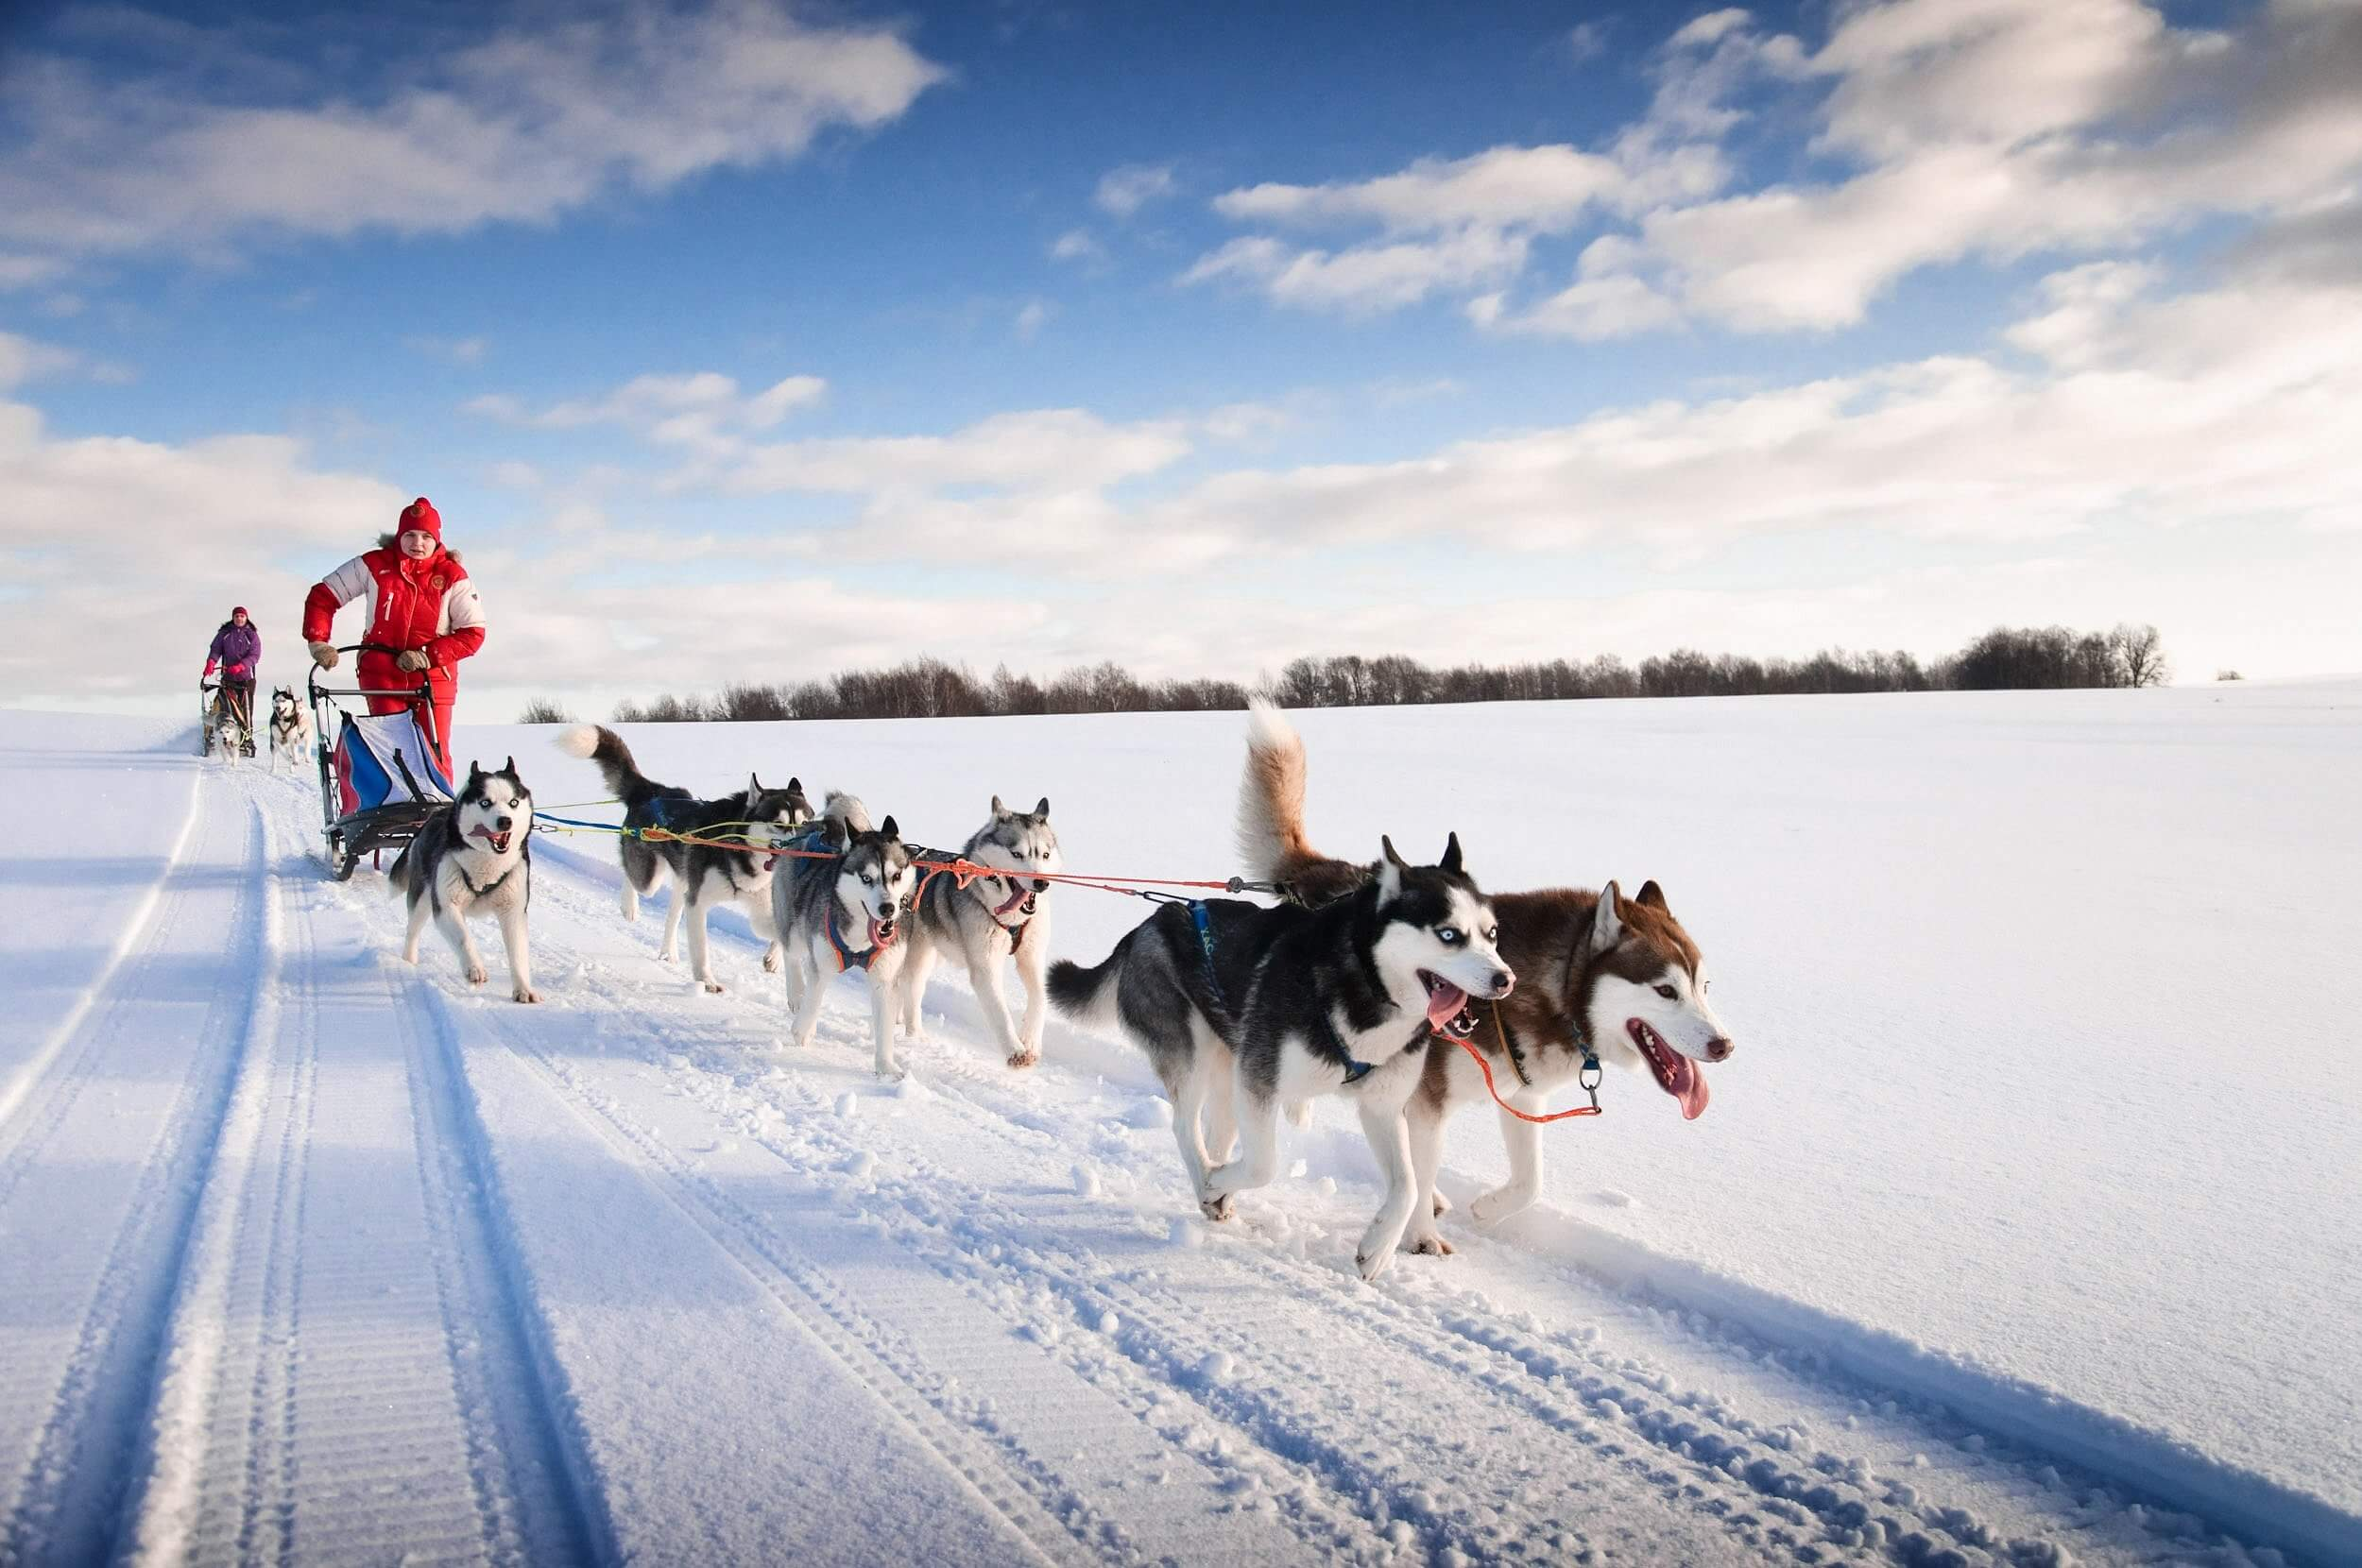 Whizz across Scotland in a husky dog sled